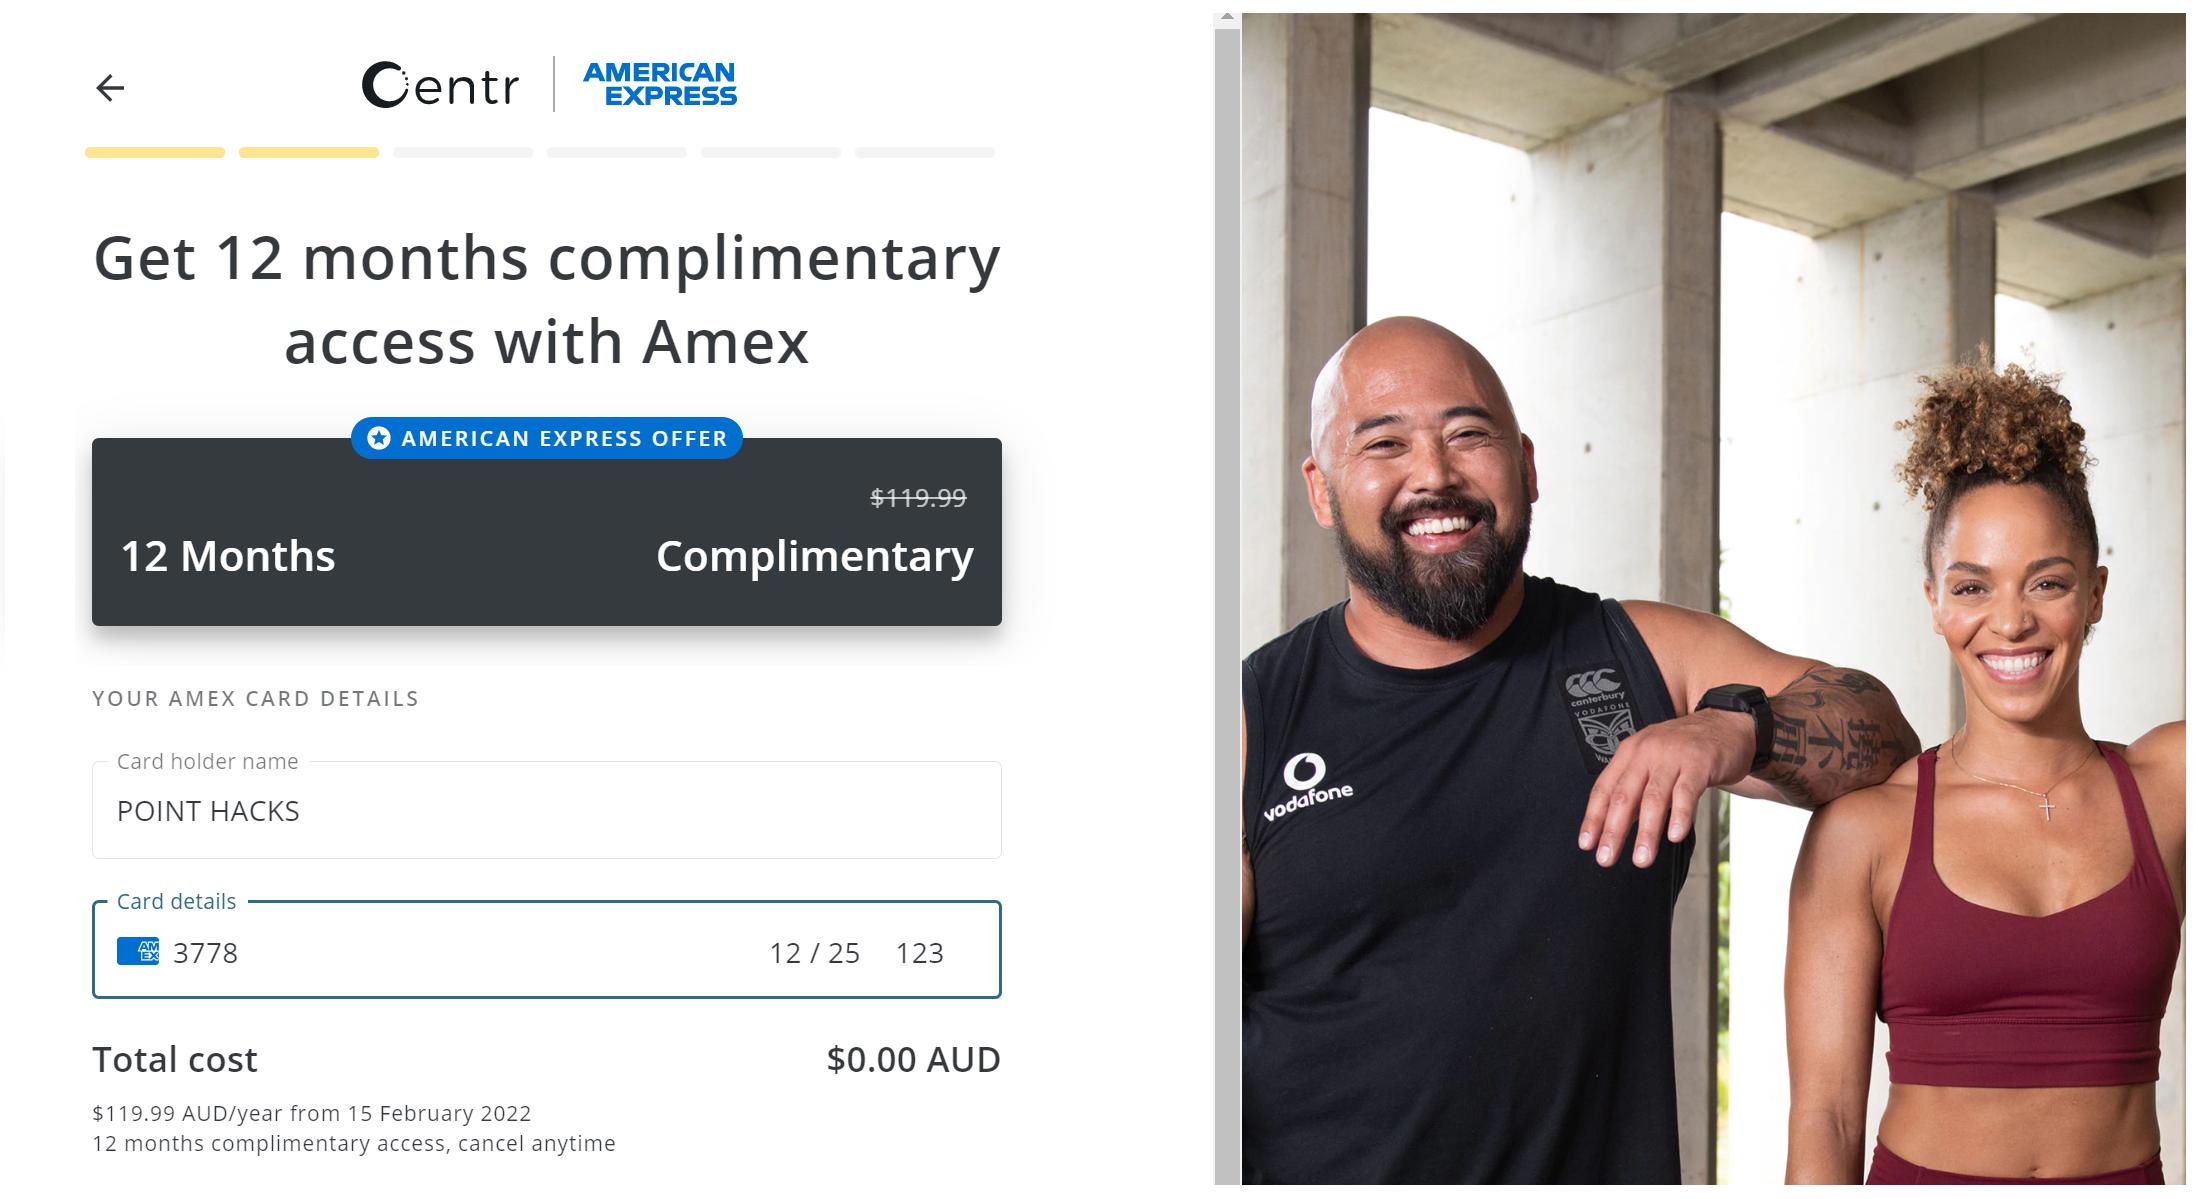 AMEX Centr Offer 2021